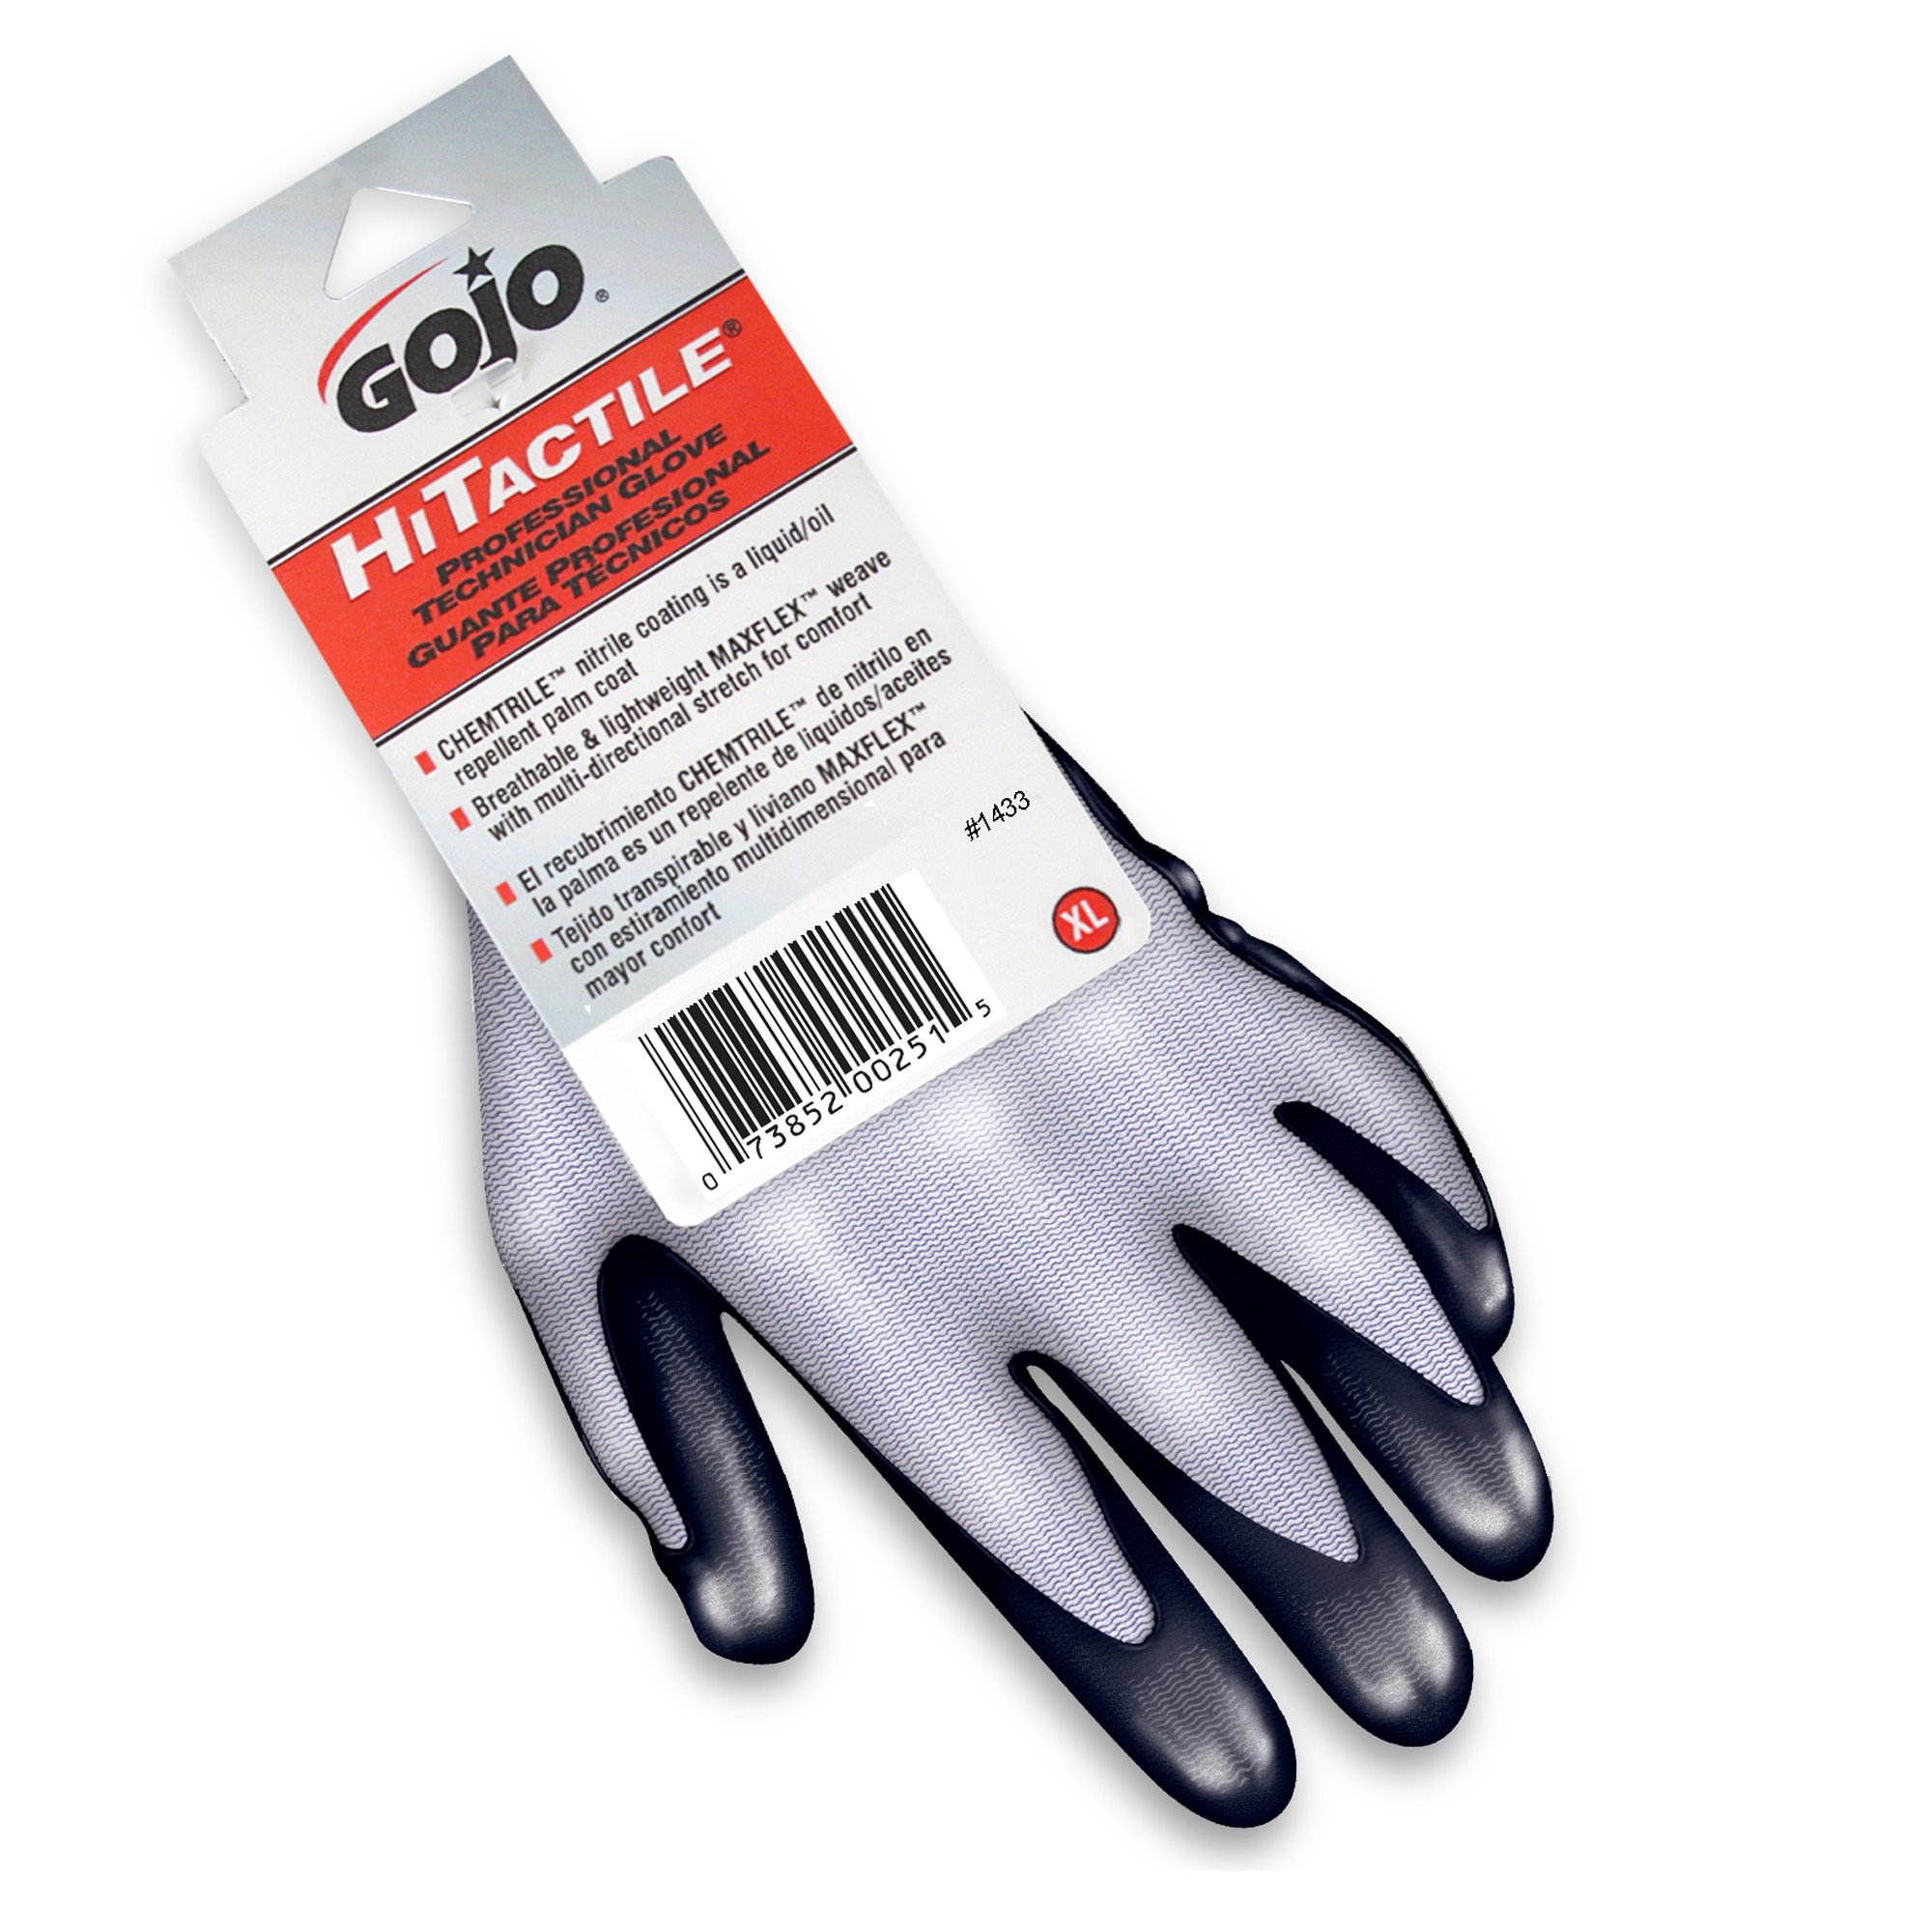 GOJO 1433-12 Hitactile Nylon Professional Technician Glove, X-Large (Pack of 12)